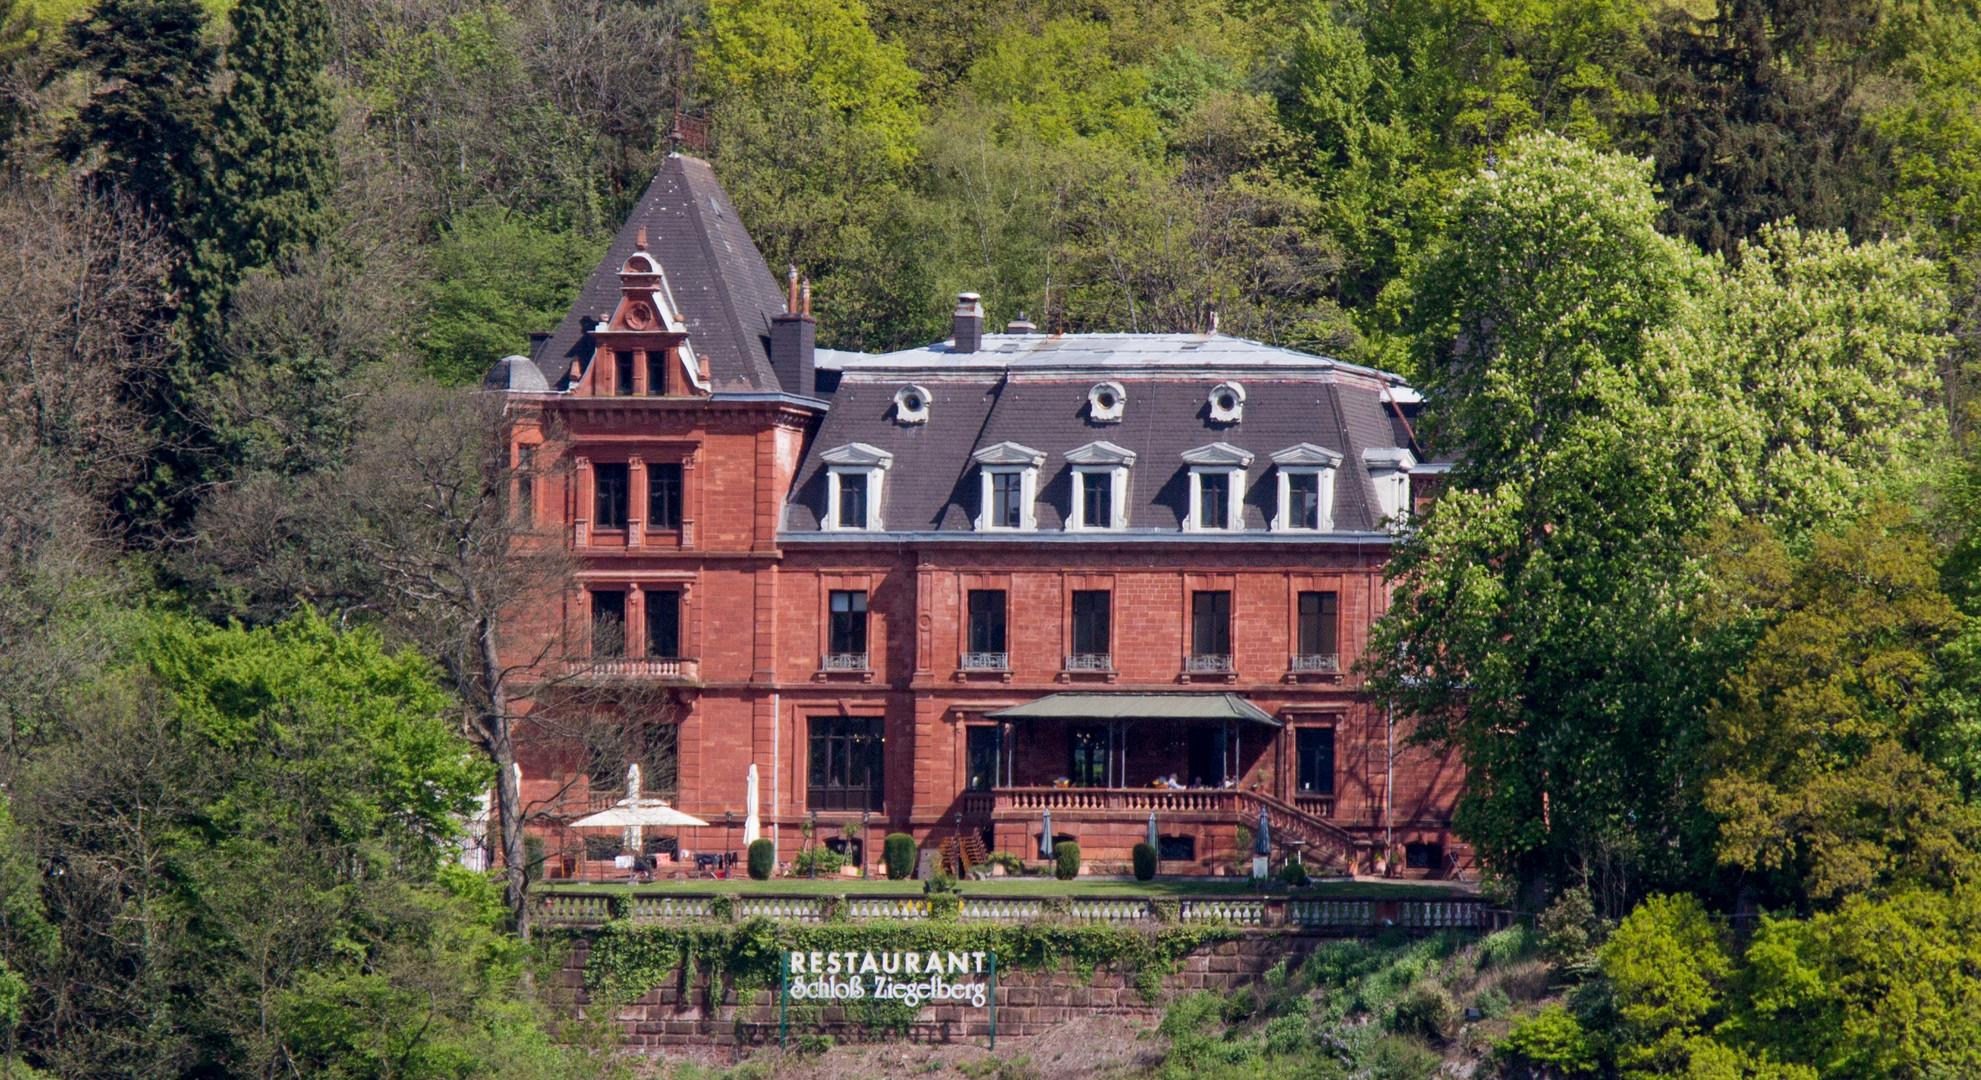 Schloss Ziegelberg Mettlach